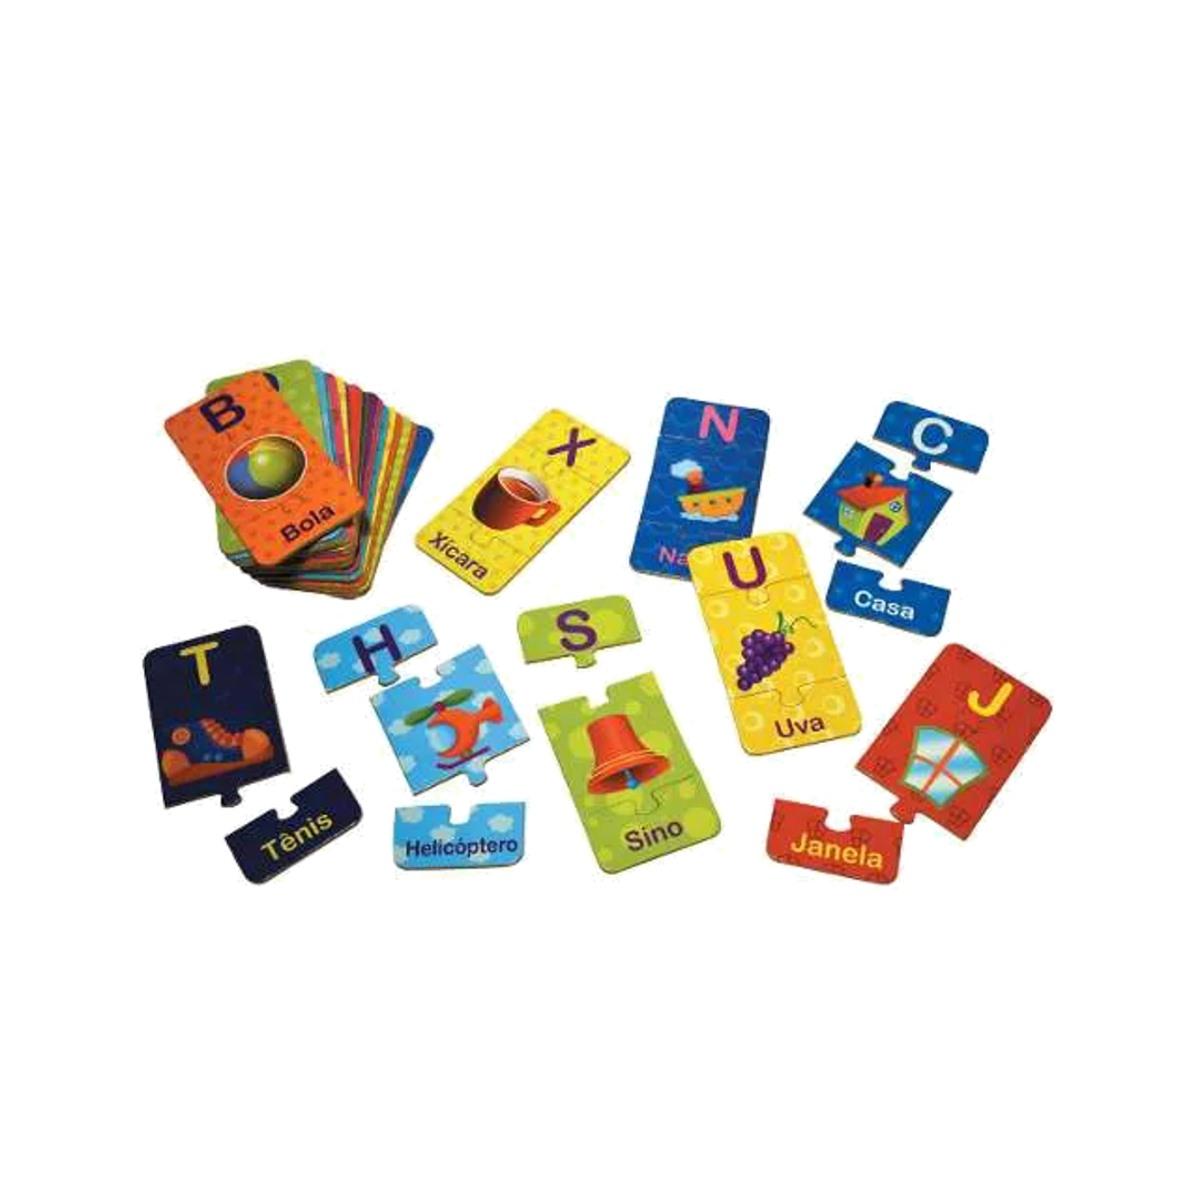 Brinquedos Educativos - Alfabeto Ilustrado 78 Peças